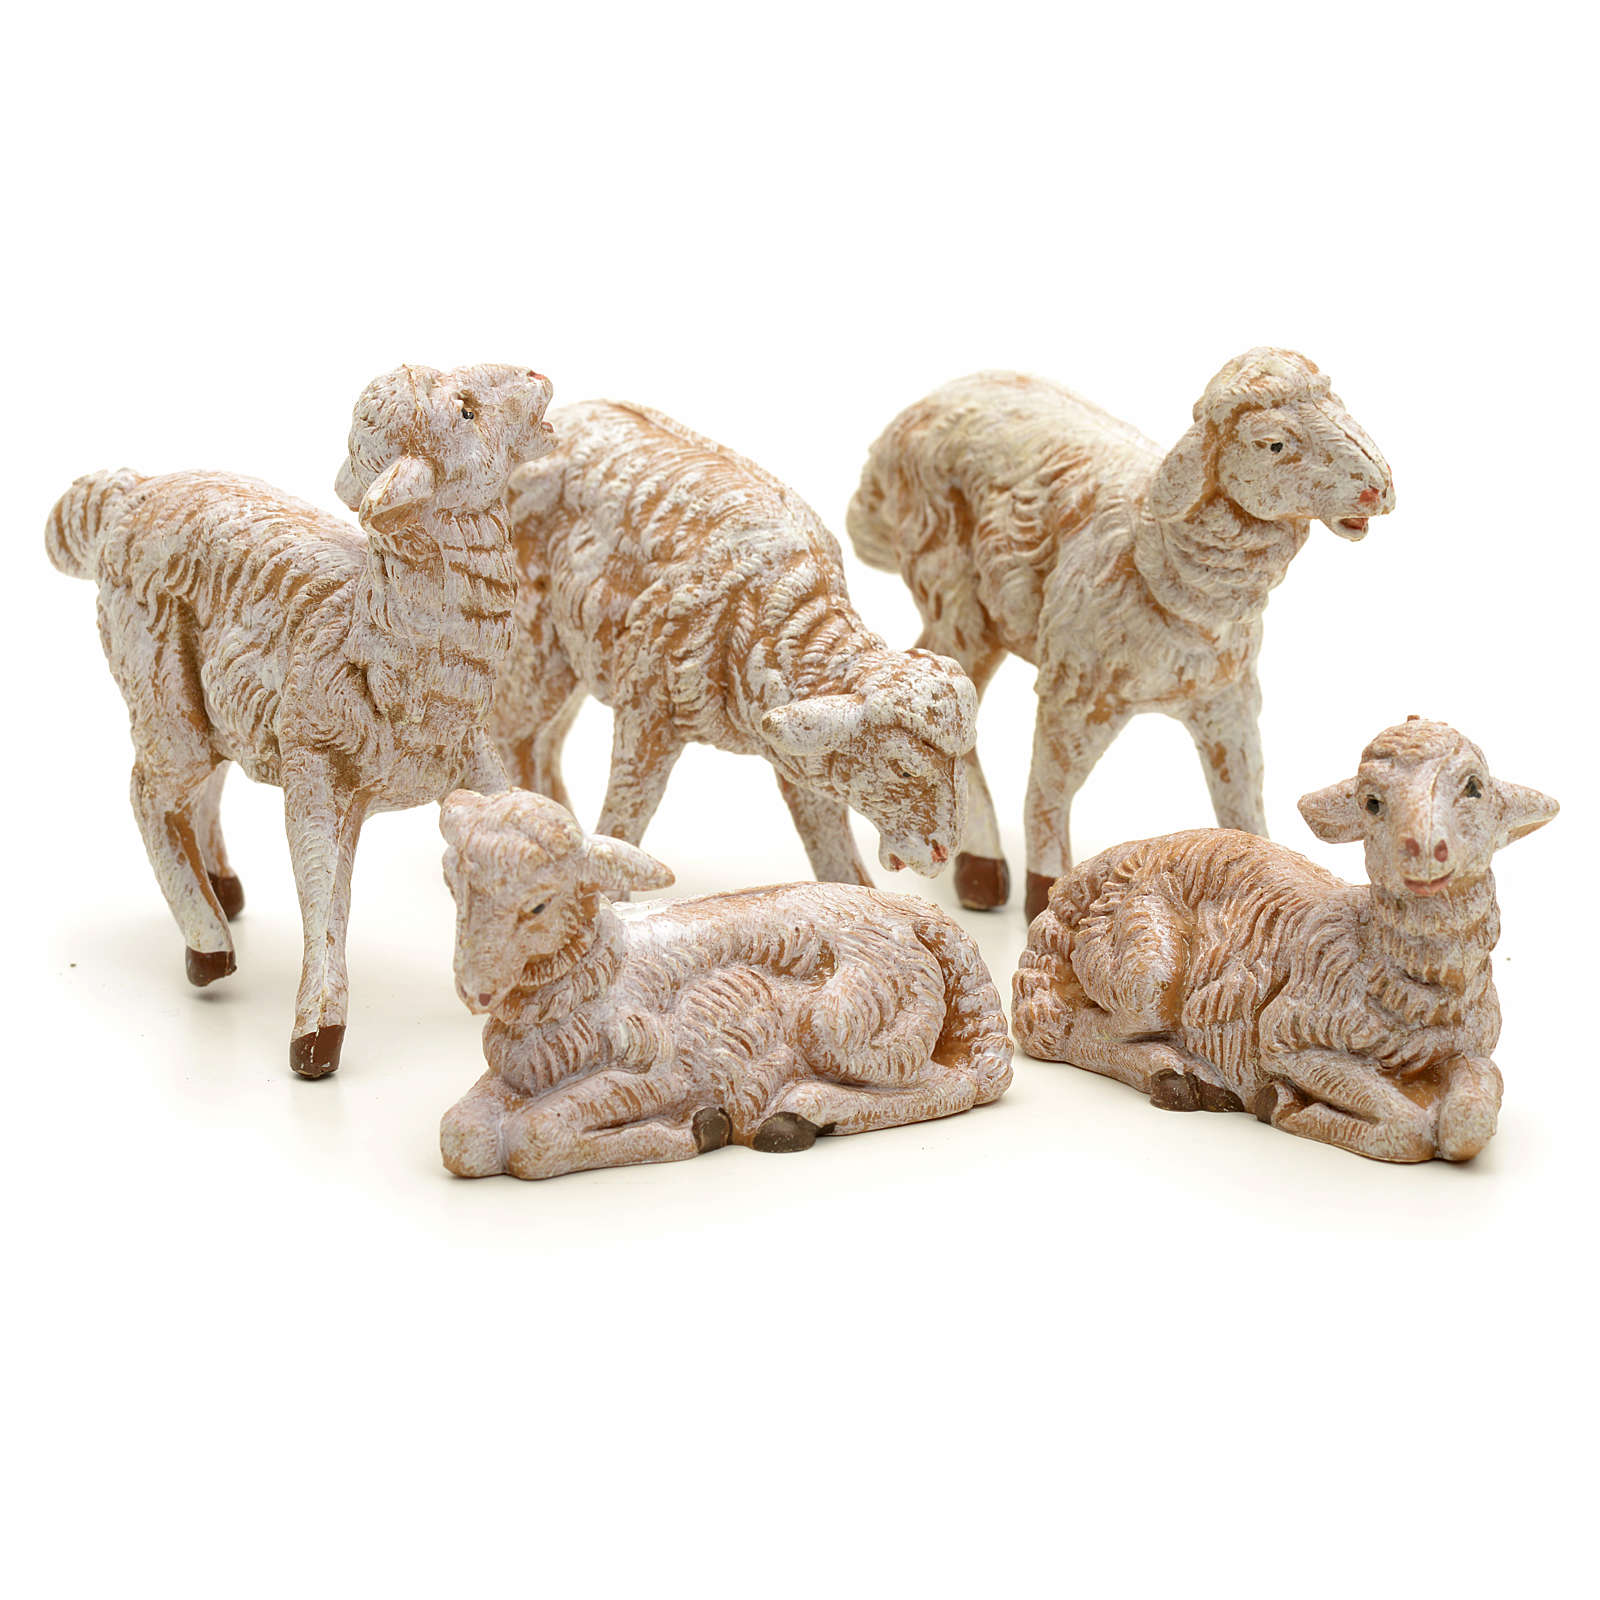 Schafe 5 Stücke Fontanini 12 cm 3